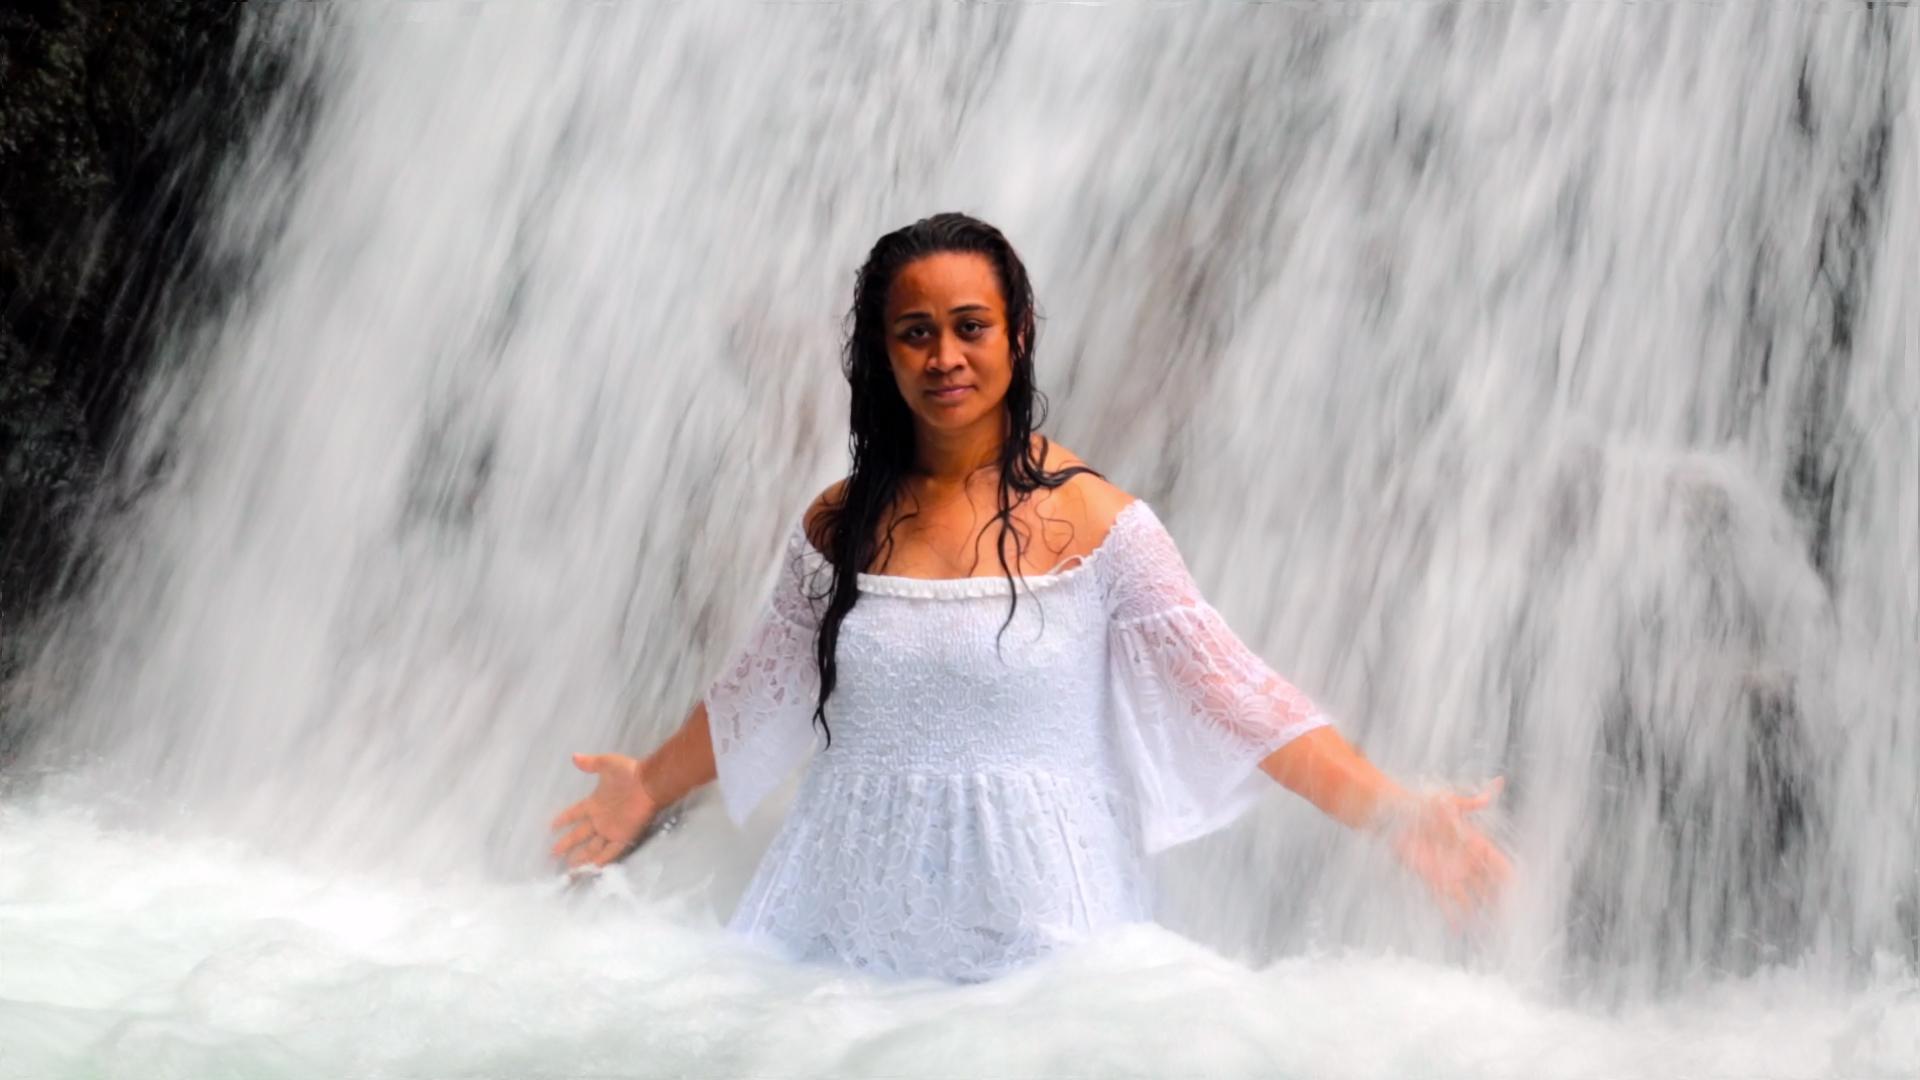 Toa'ipuapuagā: Strength in Suffering-river 1.jpg